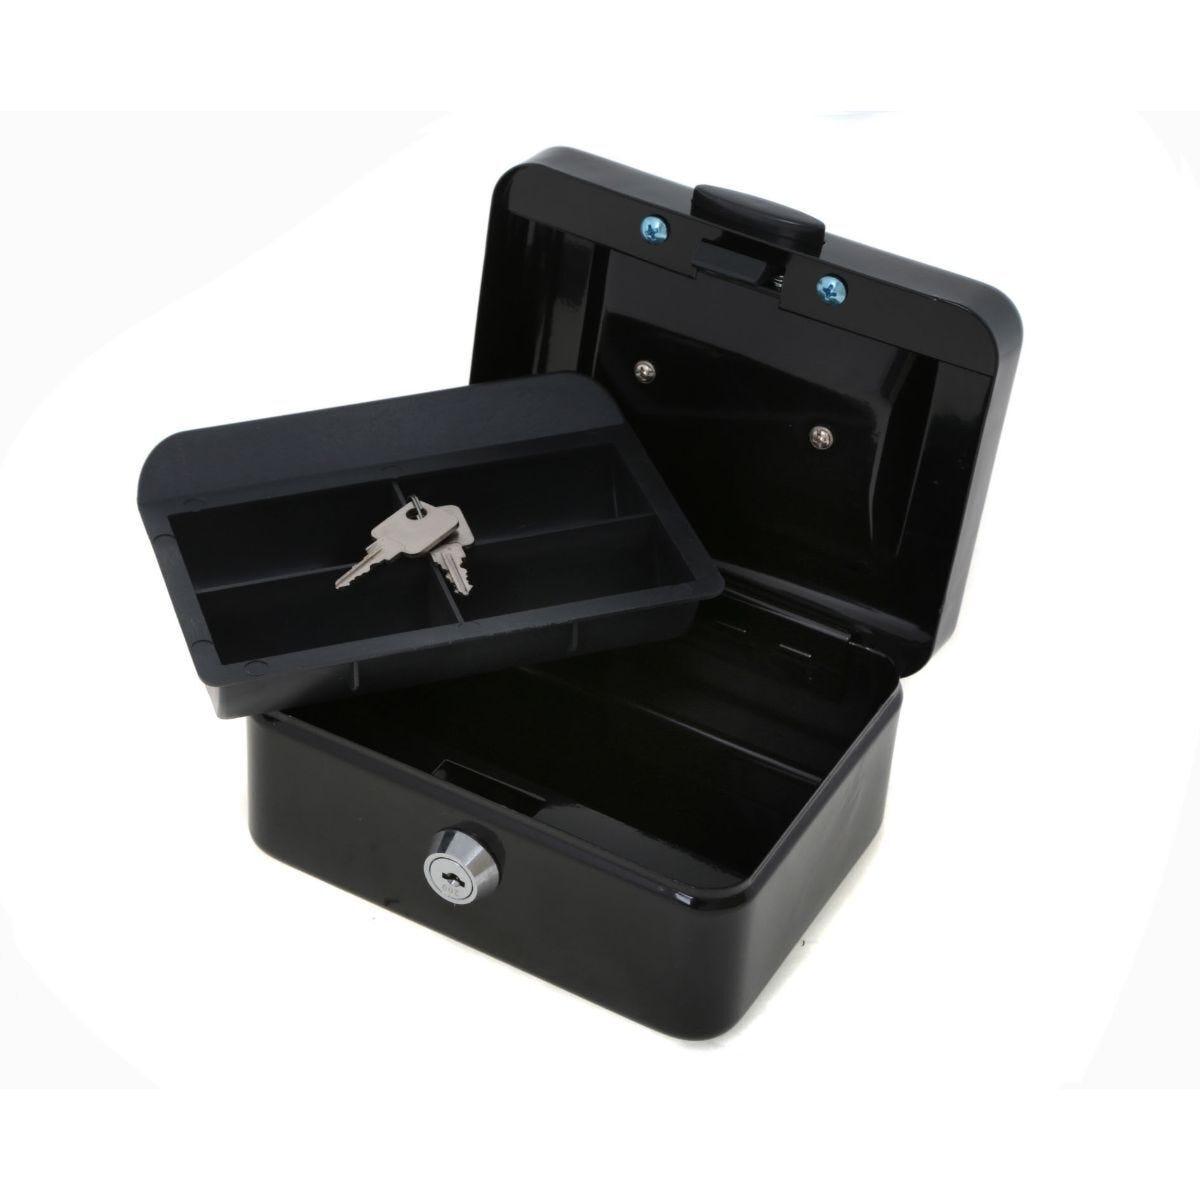 Ryman Button Release Cash Box H75xW150x110